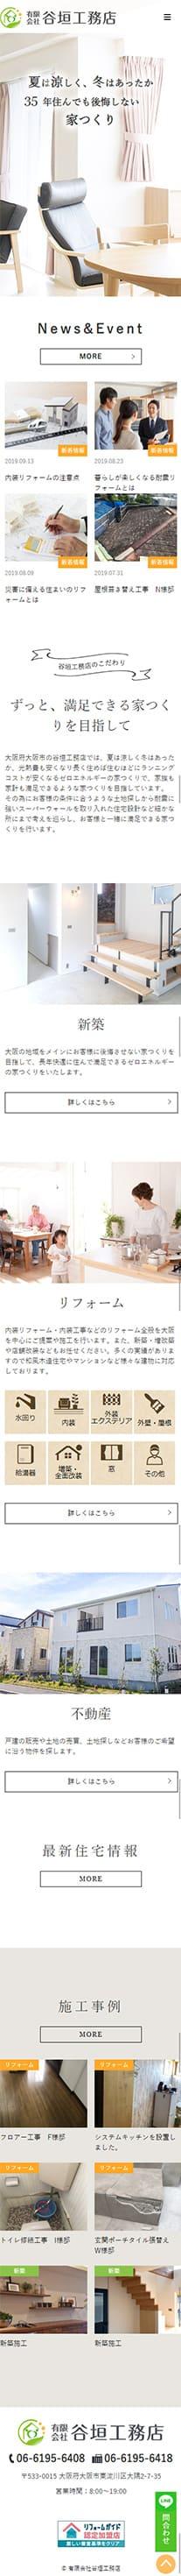 有限会社谷垣工務店スマホTOP画像